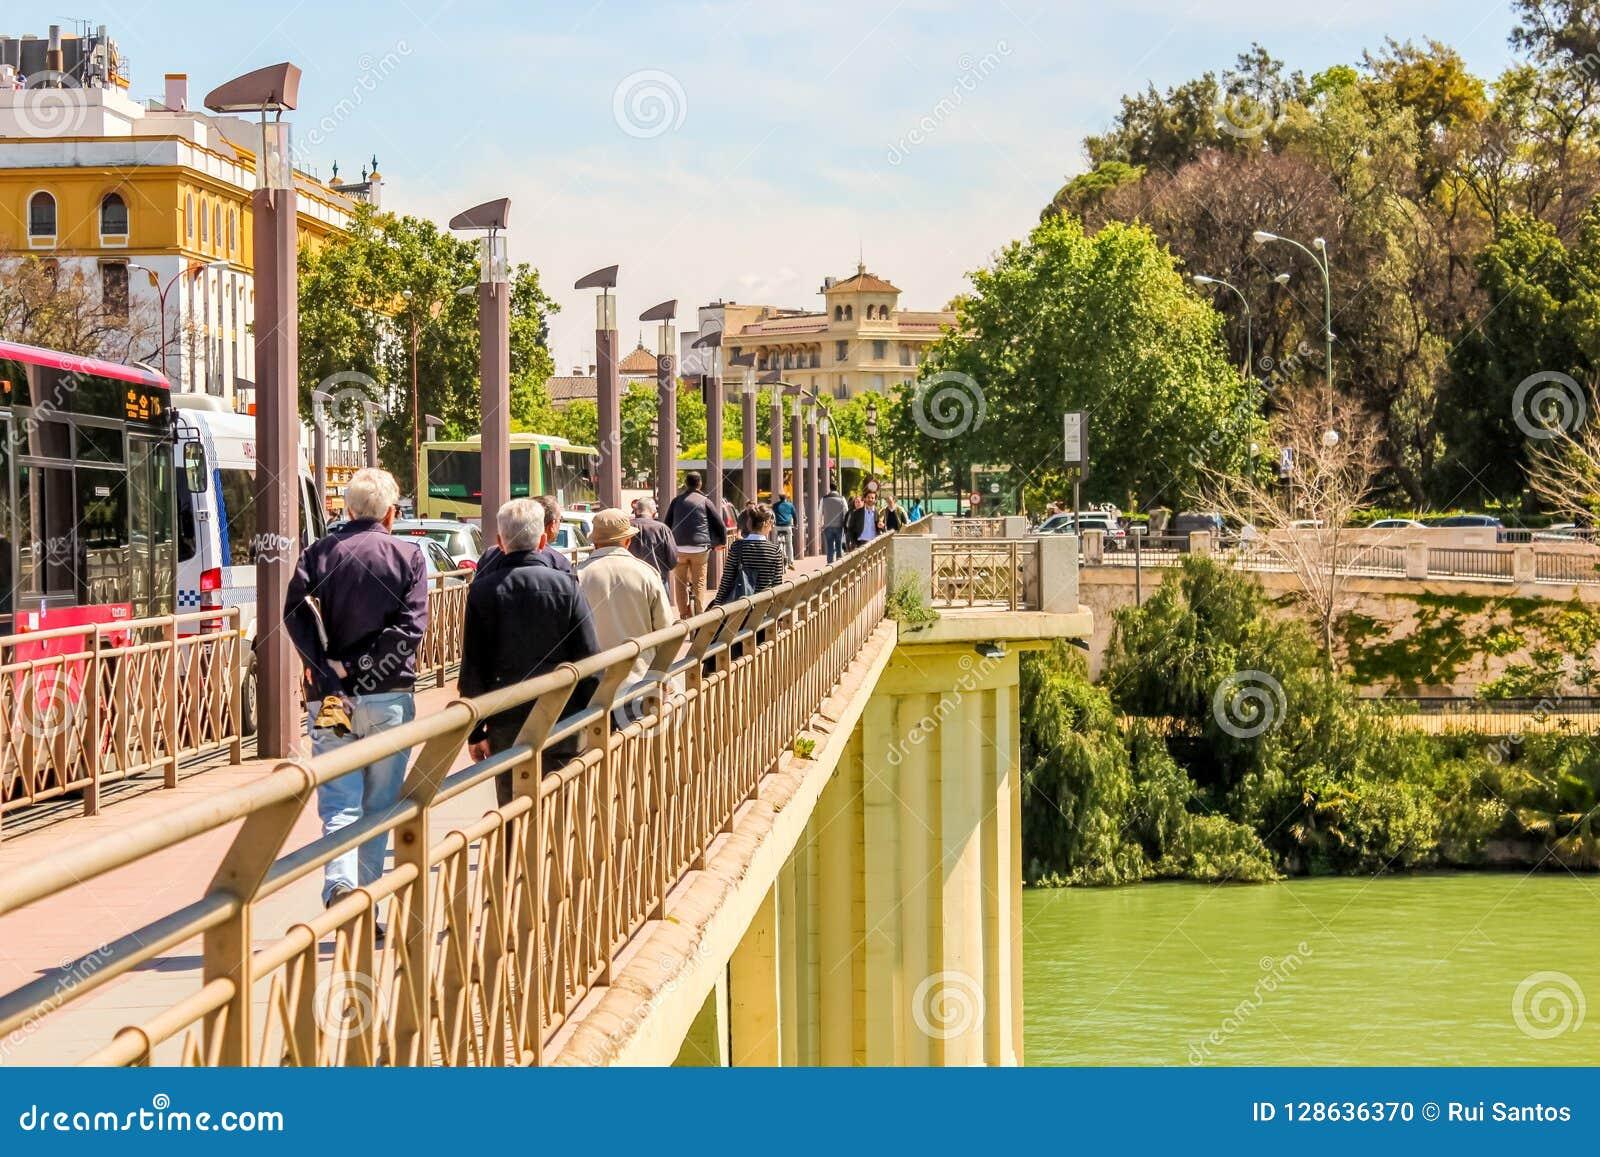 Bridge Puente San Telmo, in Seville, Spain